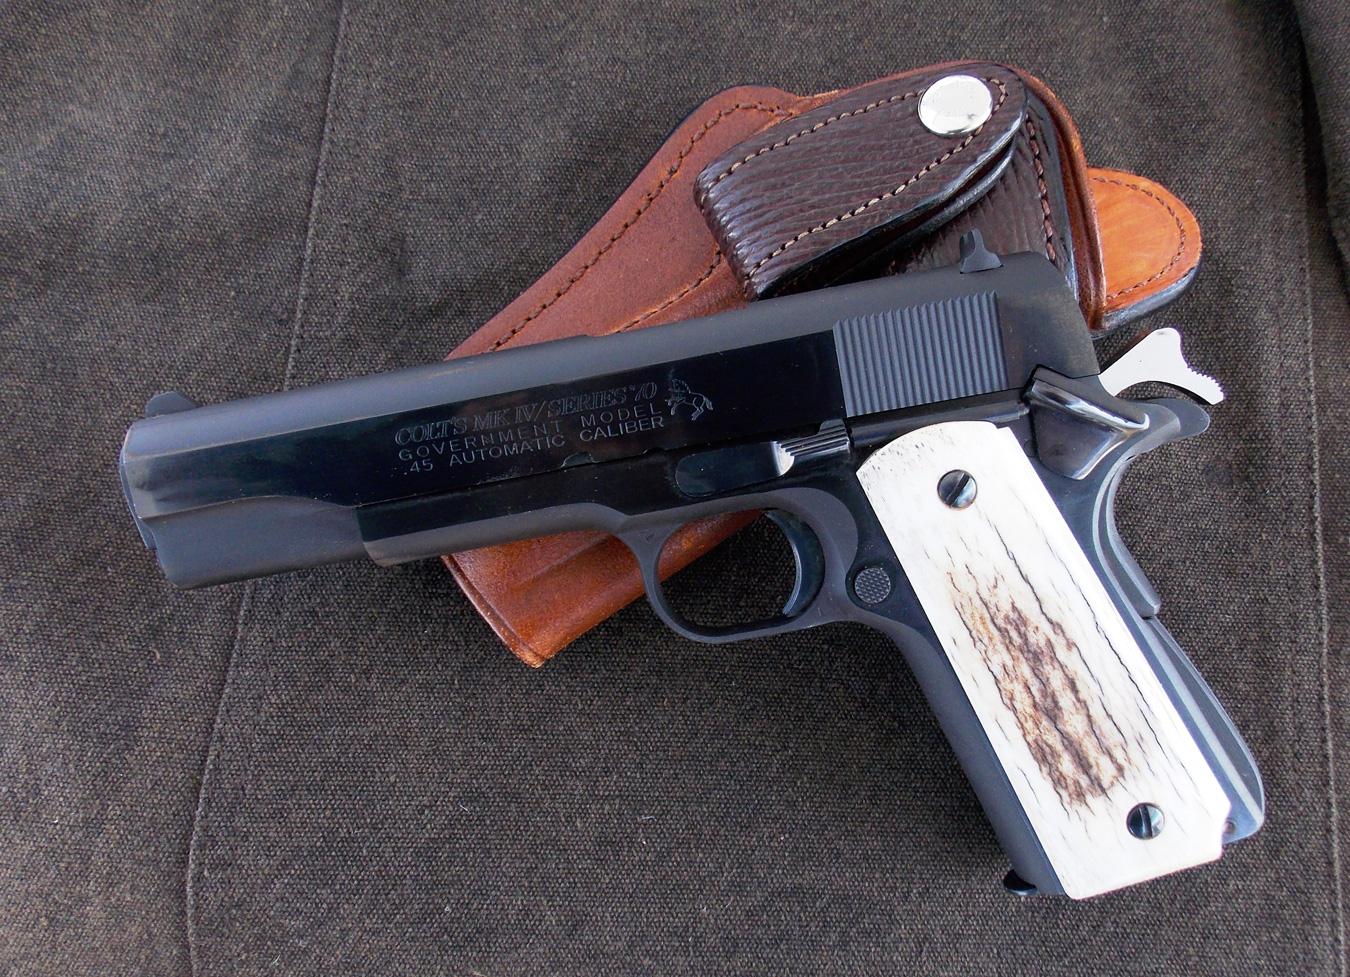 Colt Series 70 1911 .45 ACP pistol